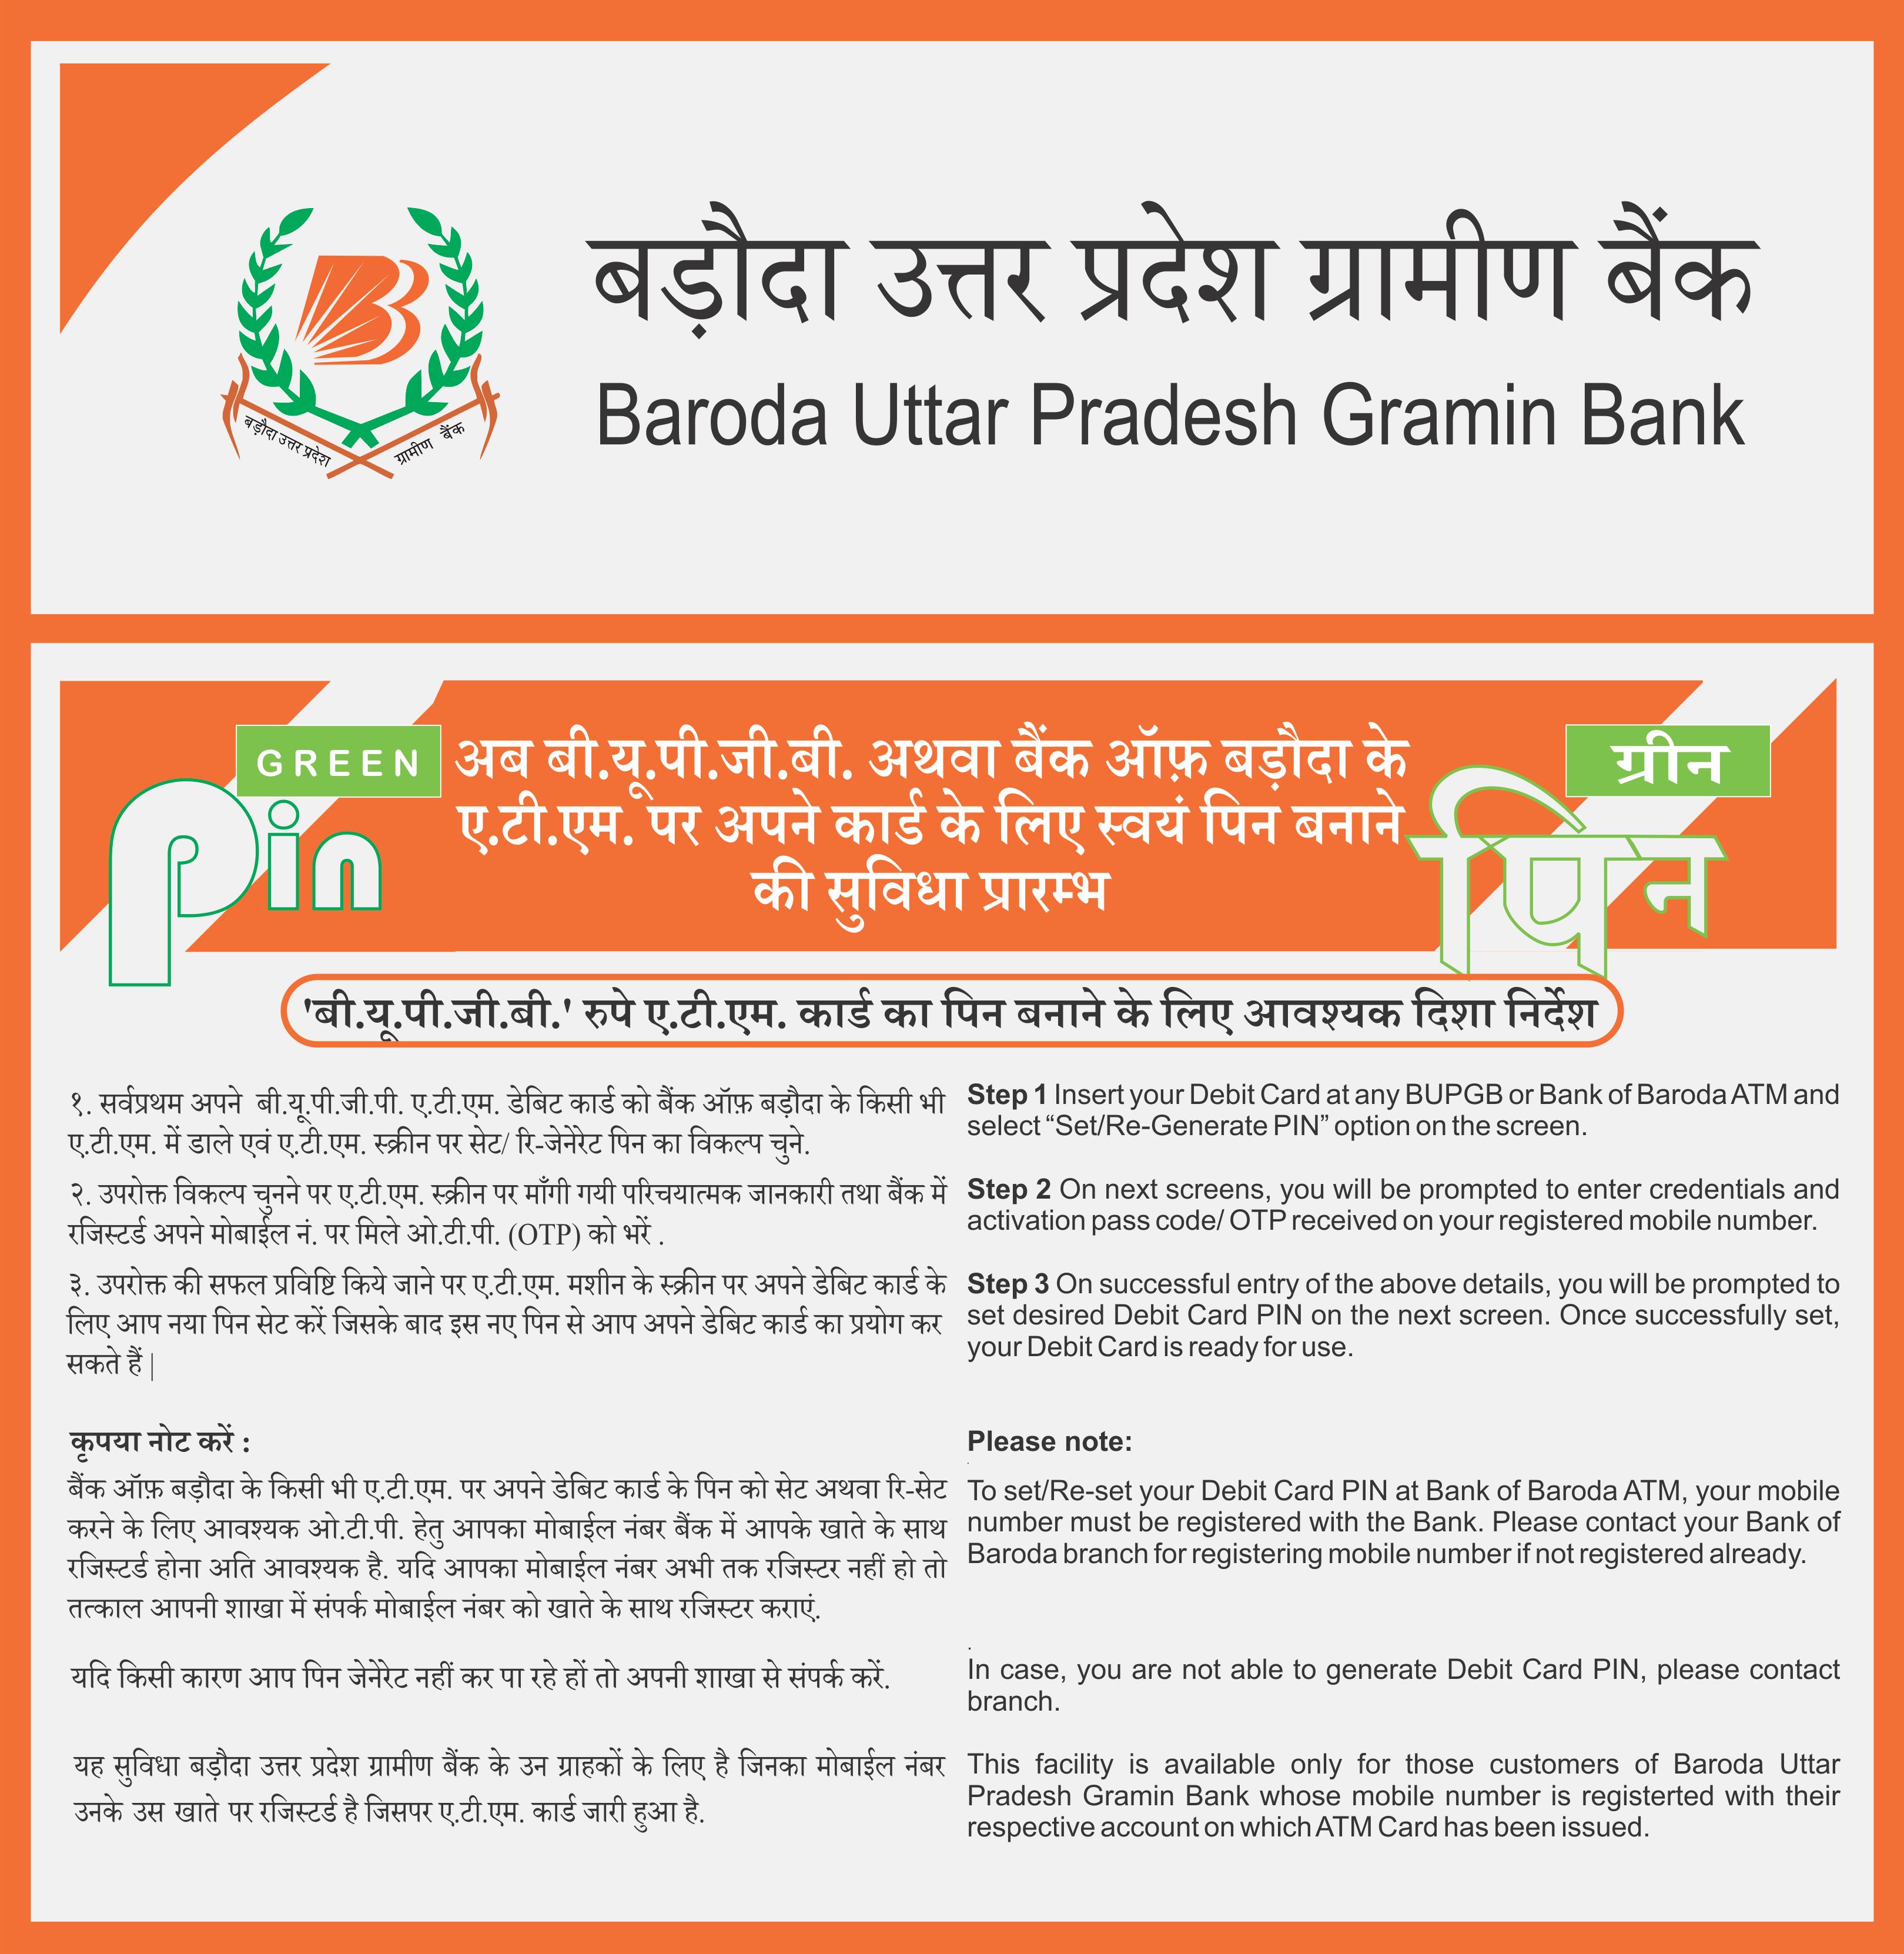 Baroda Uttar Pradesh Gramin Bank Baroda Uttar Pradesh